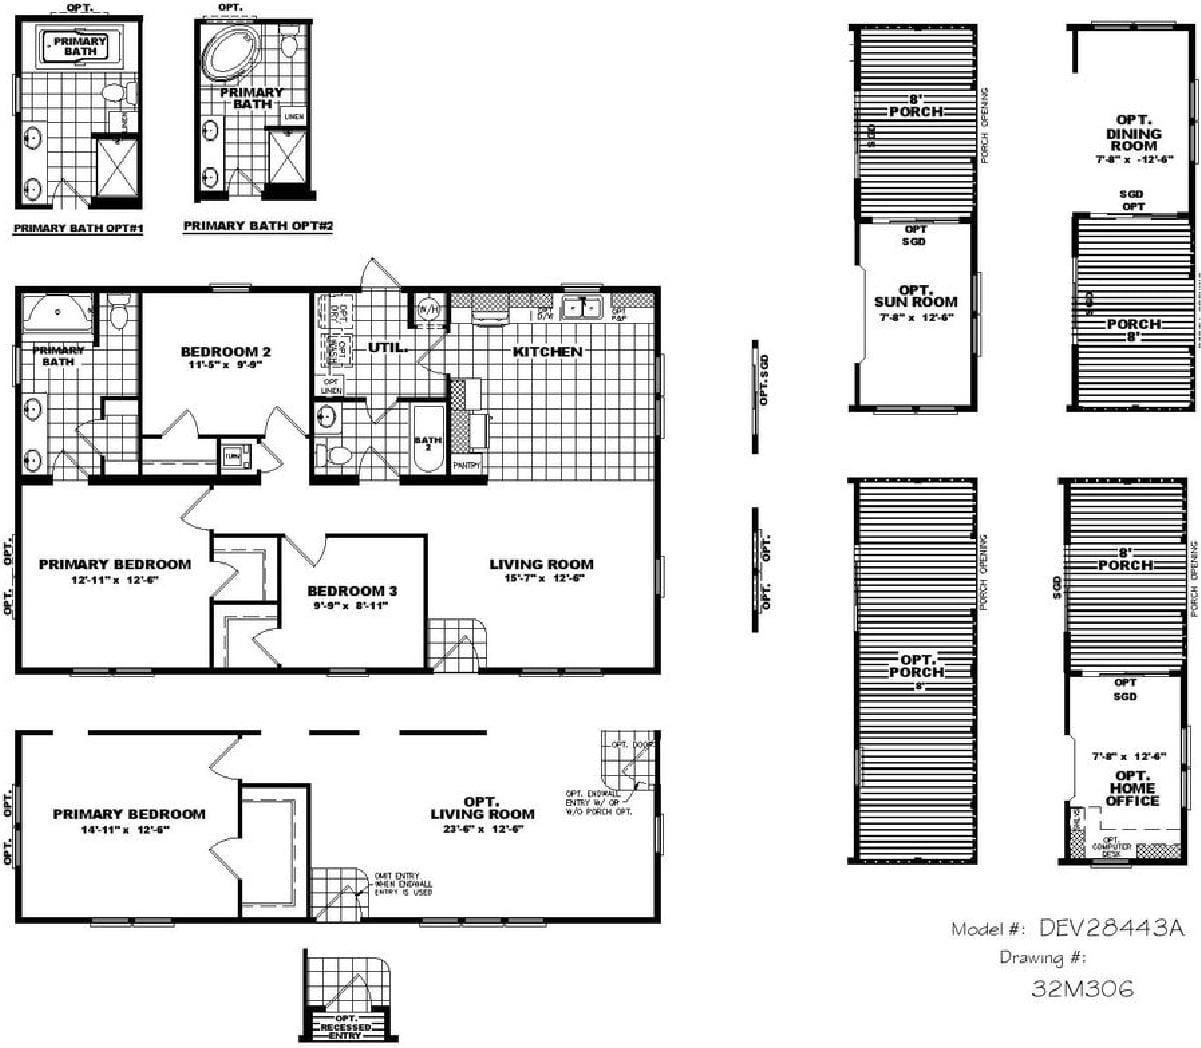 Clayton Developer - Hogan 28X44 | Braustin - A Better Way Home